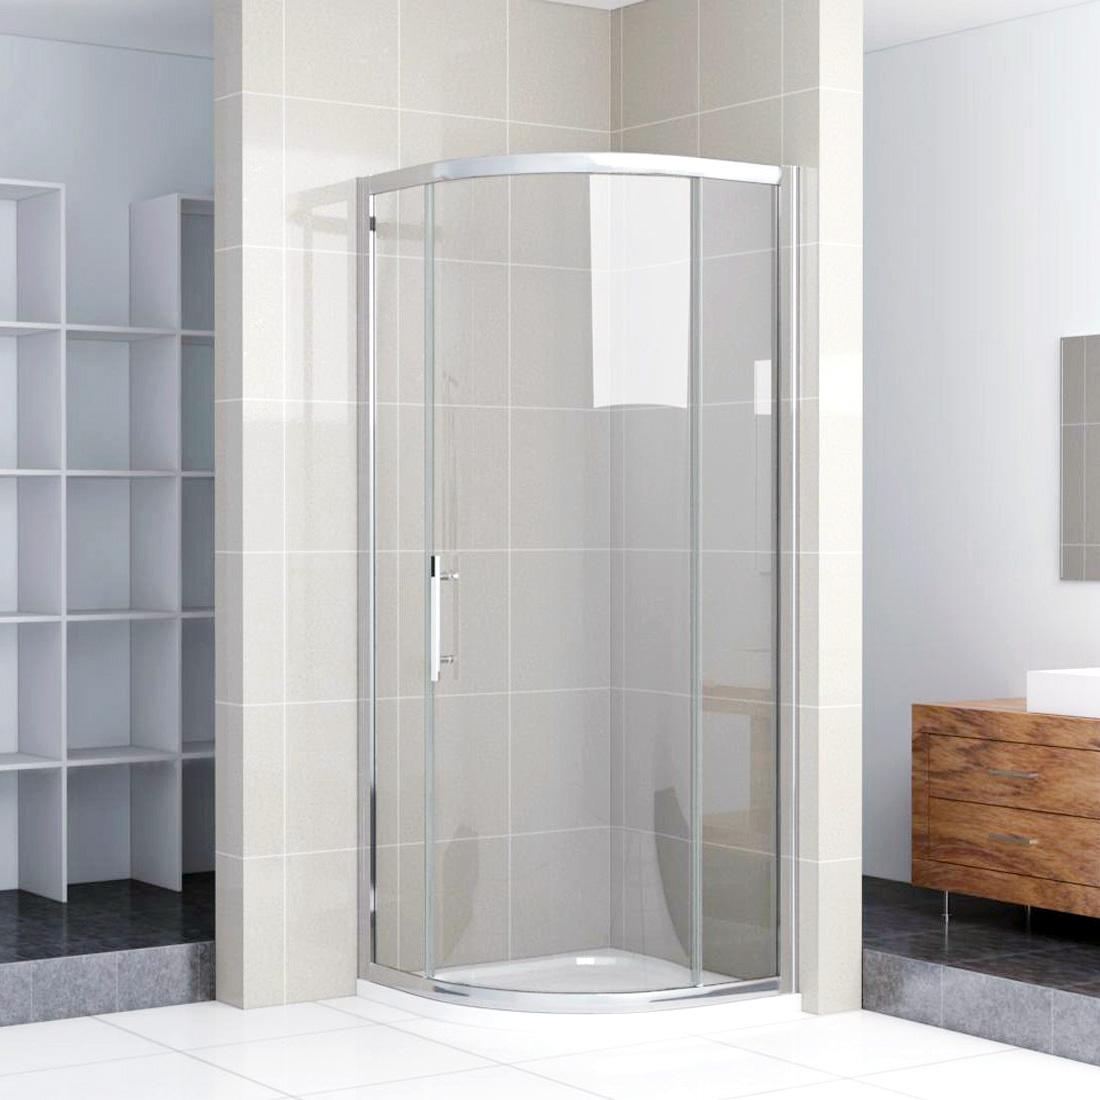 Offset Quadrant Shower Enclosure Amp Tray Corner Cubicle